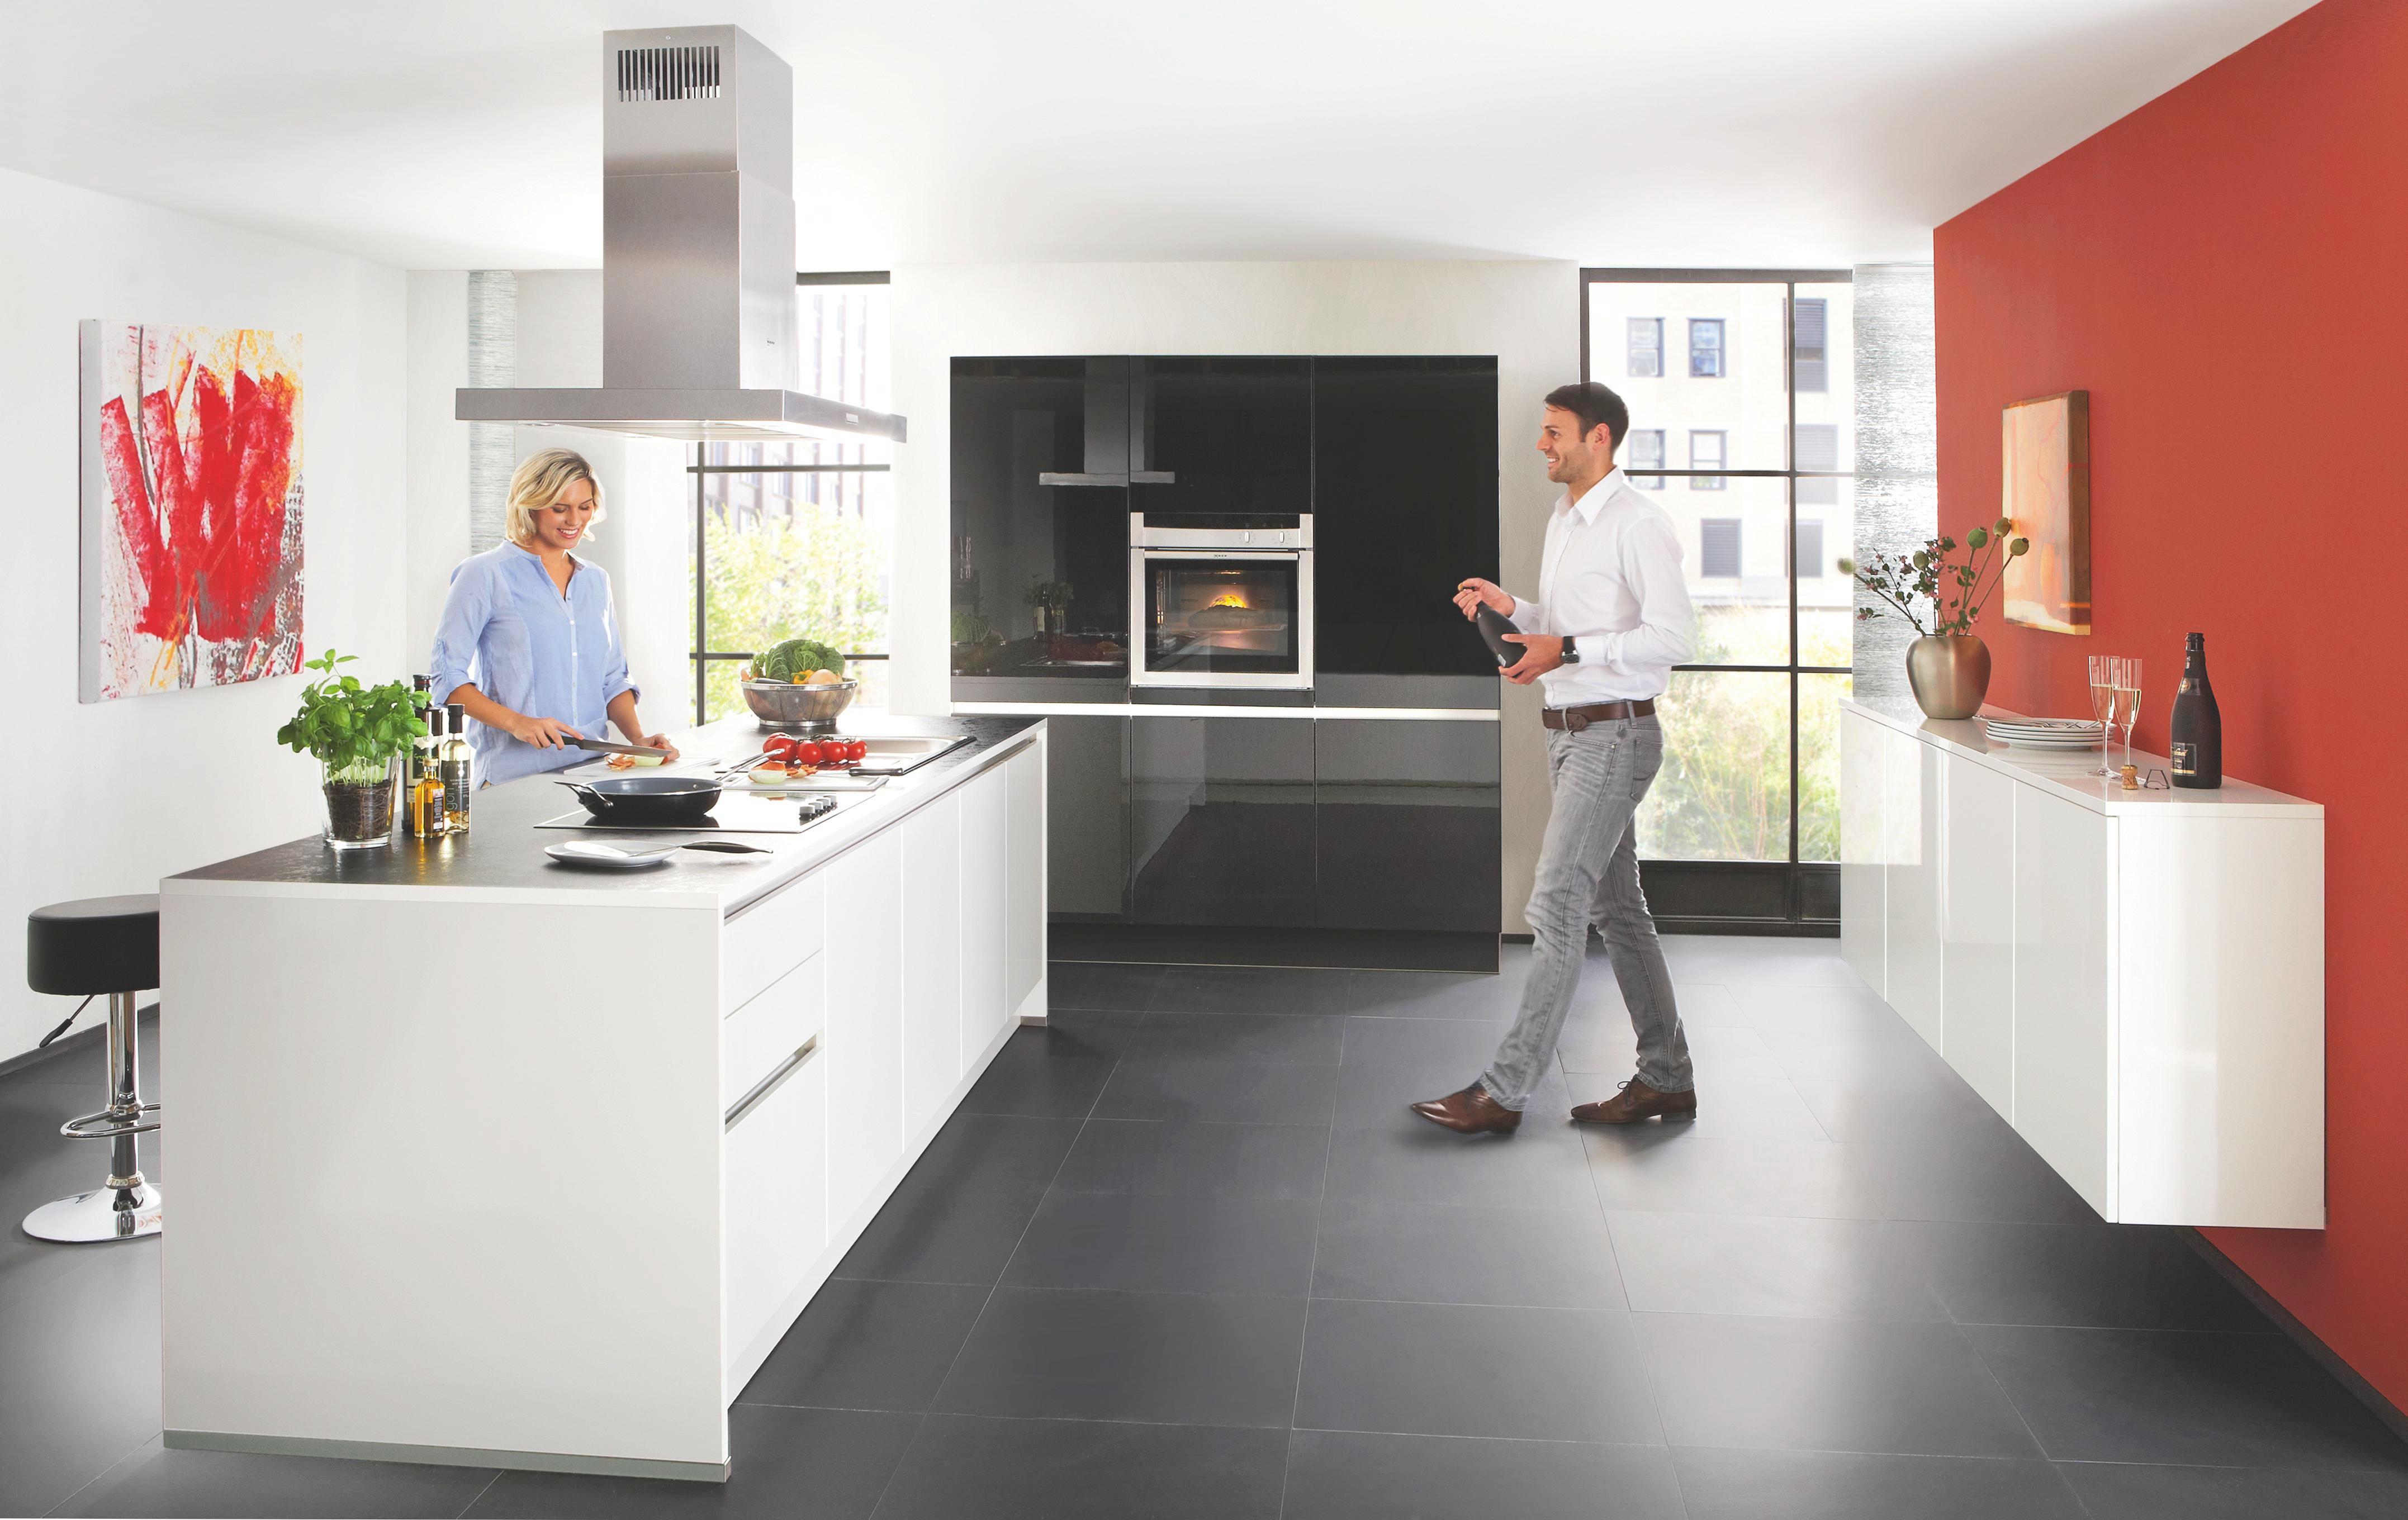 Gemütlich Küche Backfliesen Ideen Galerie - Küchenschrank Ideen ...